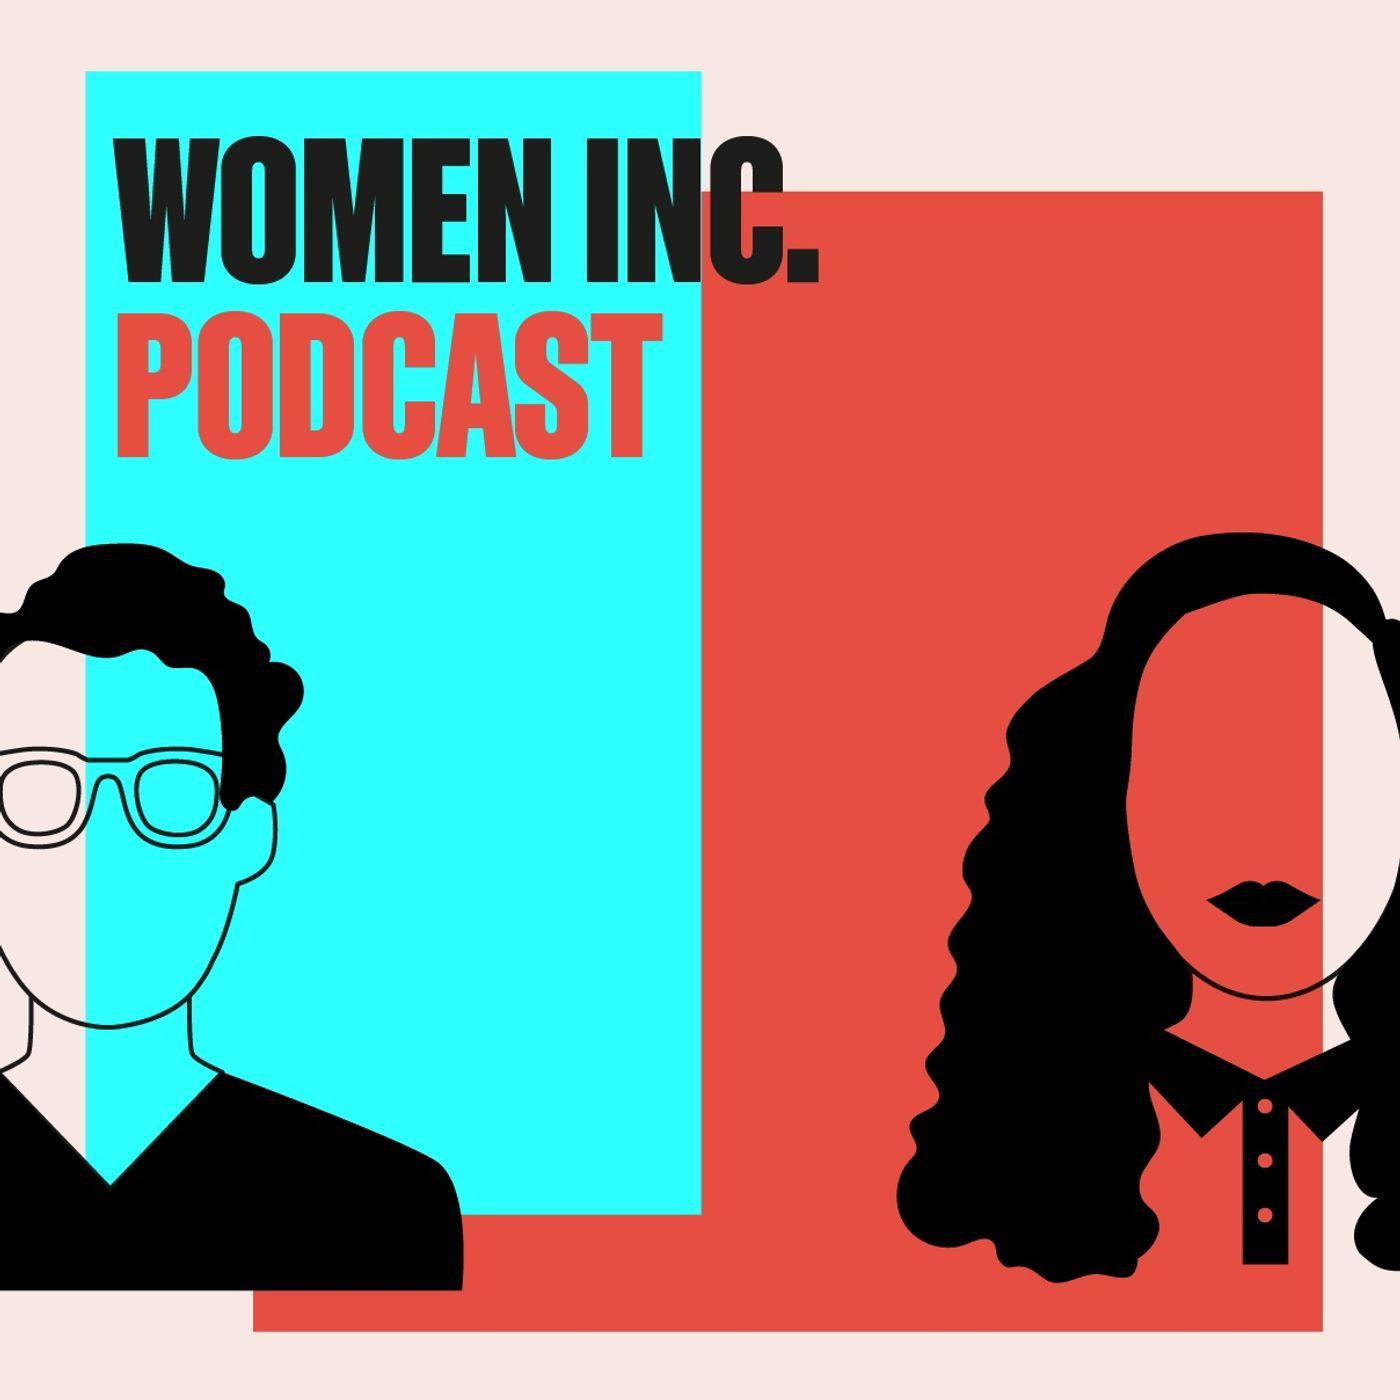 WOMEN Inc. Podcast logo